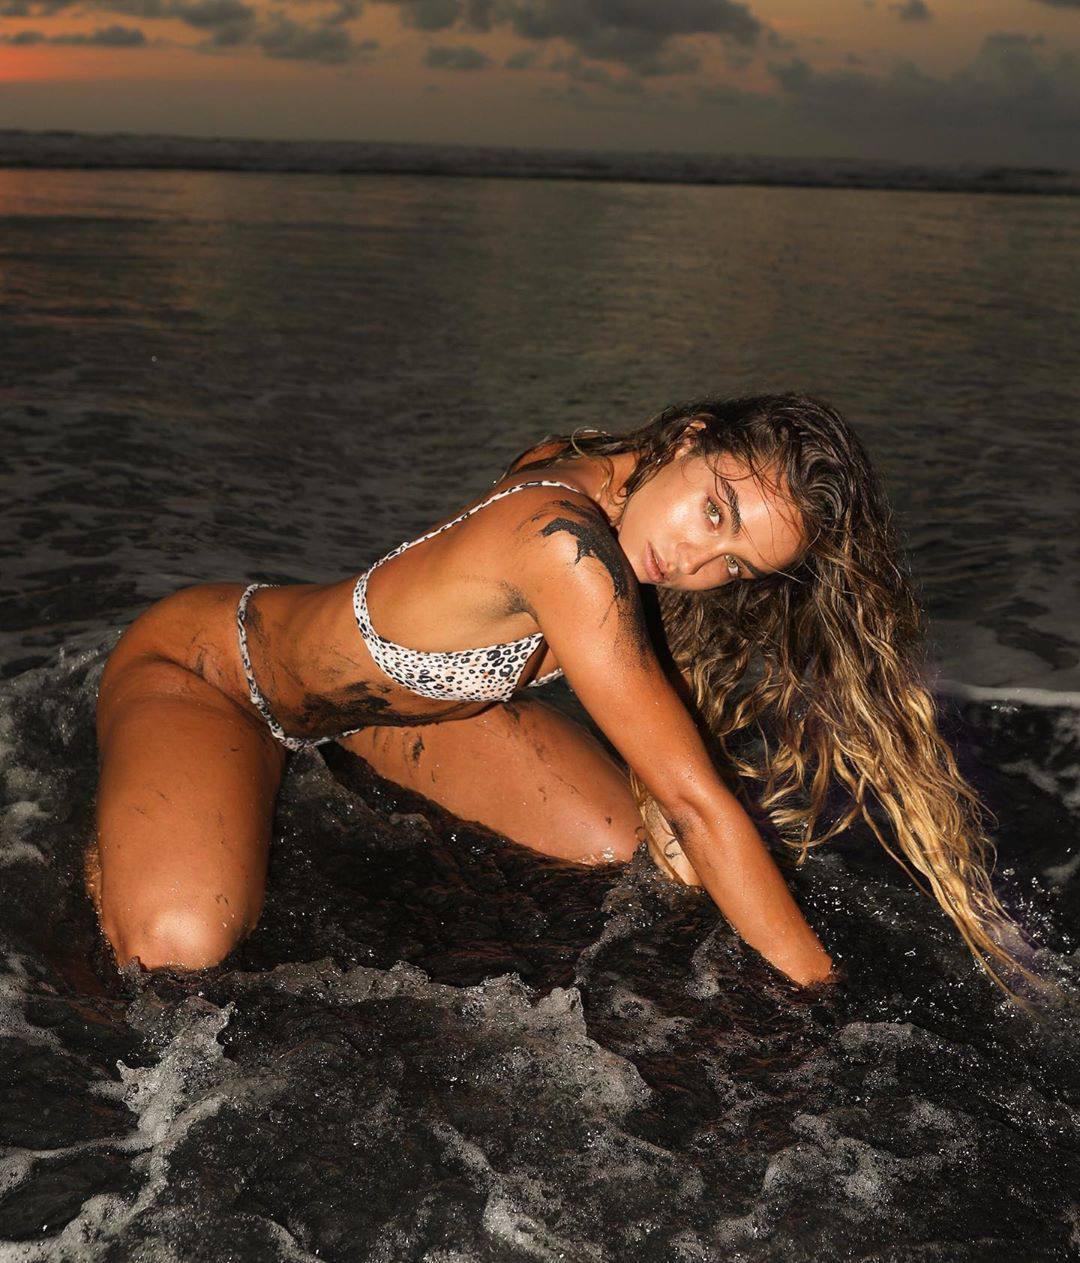 Sommer Ray – Hot Ass In Thong Bikini In Beautiful Sunset Photoshoot 0005